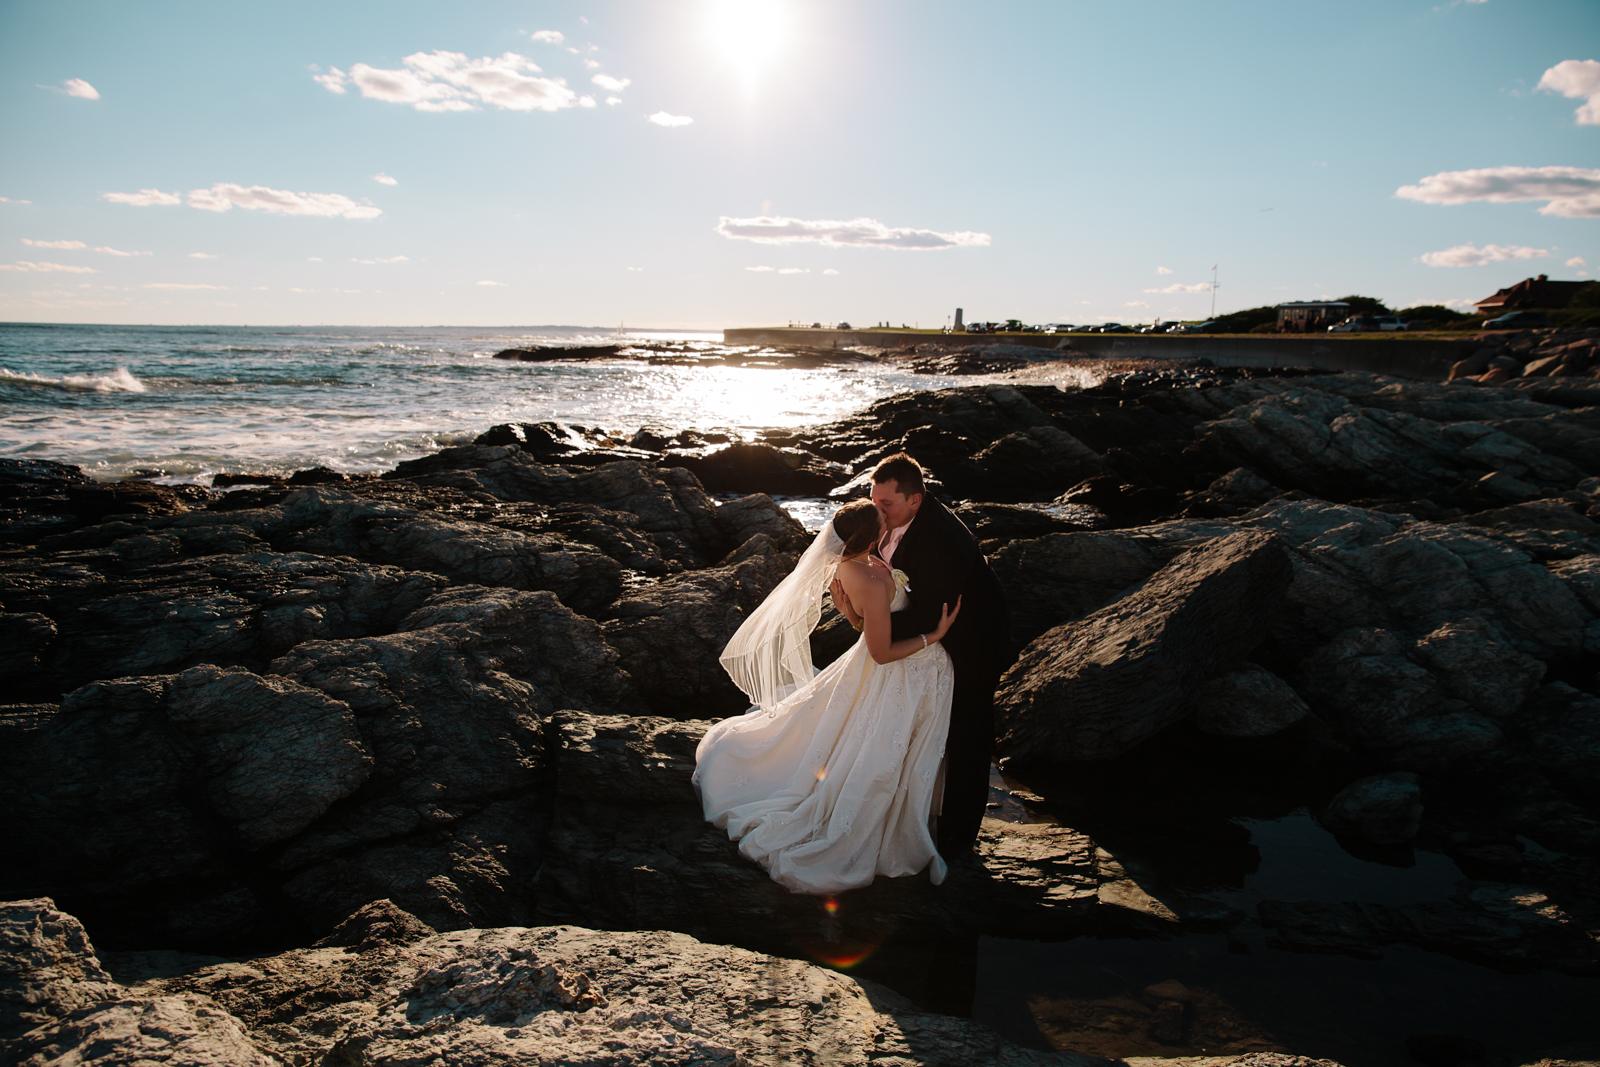 Eastons-Beach-Rotunda-Ballroom-Wedding-Newport-Rhode-Island-PhotographybyAmandaMorgan-73.jpg